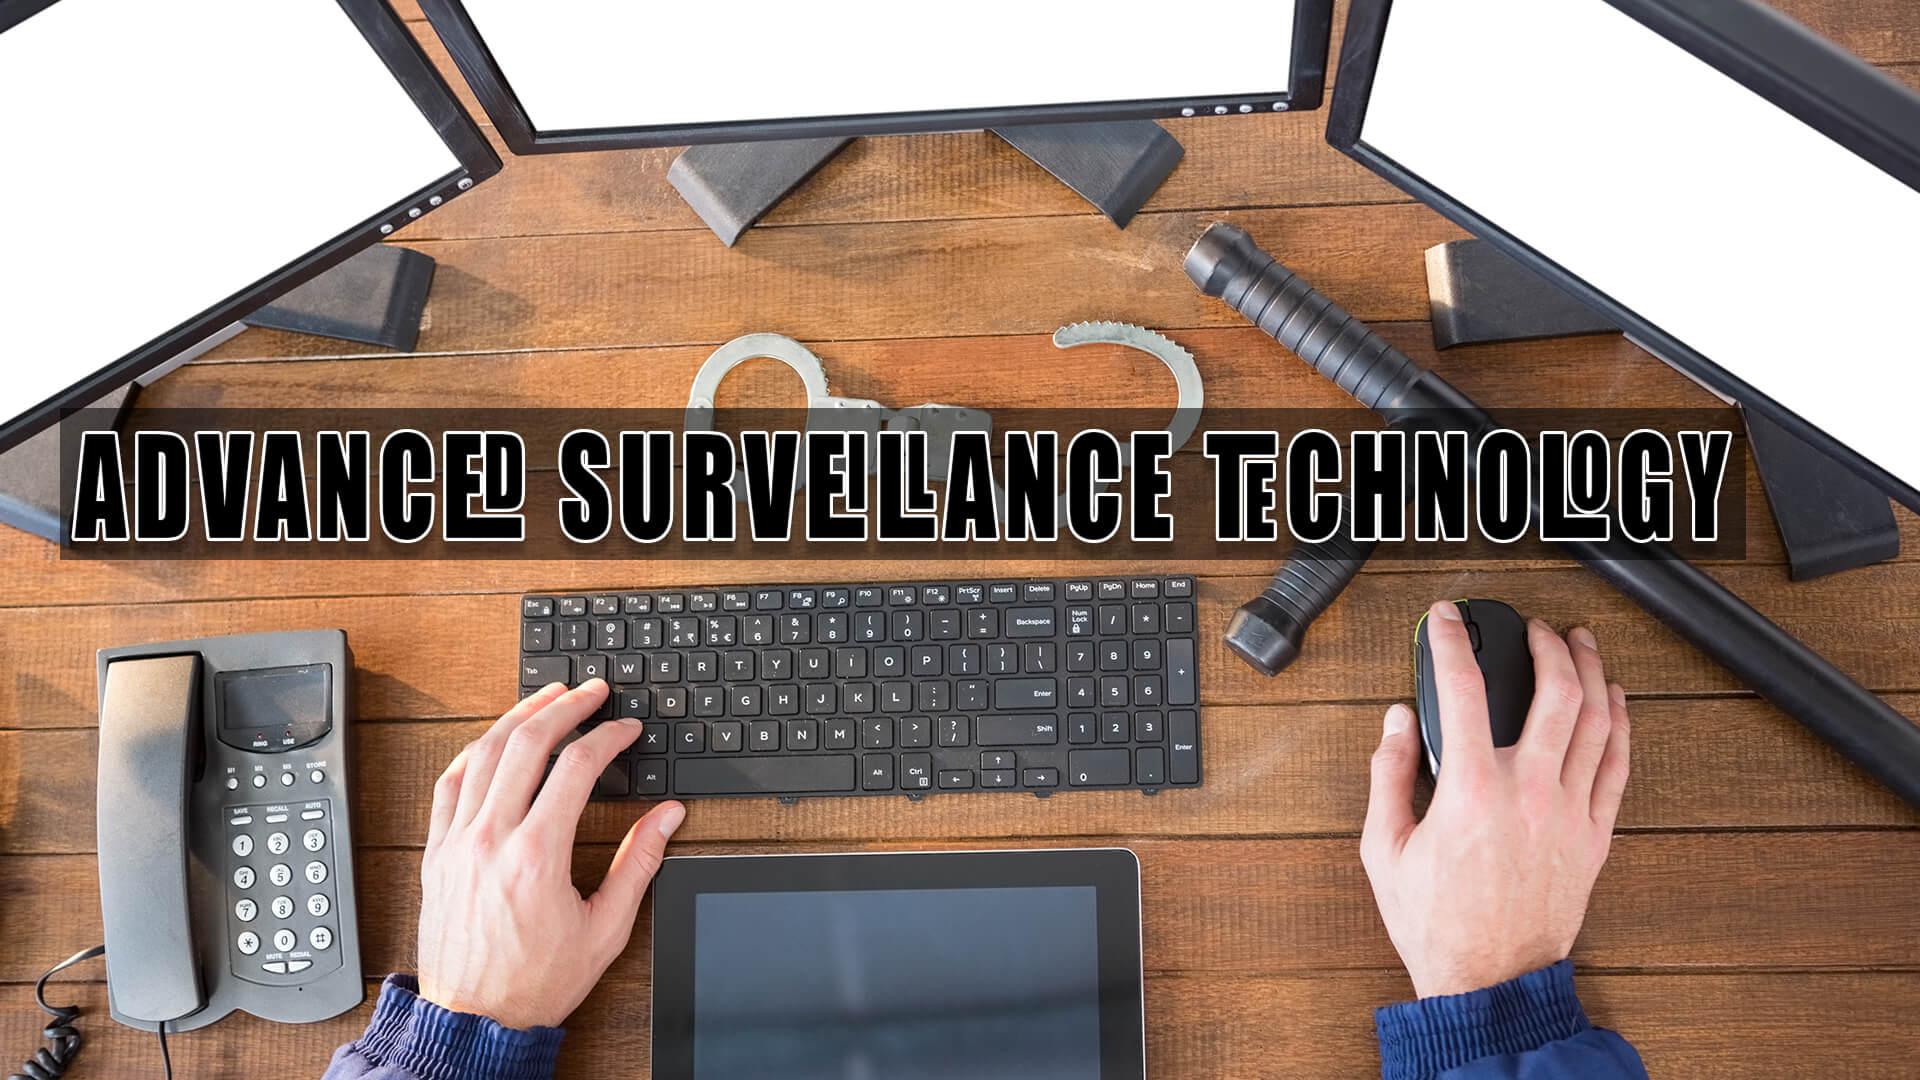 Advanced Surveillance Technology